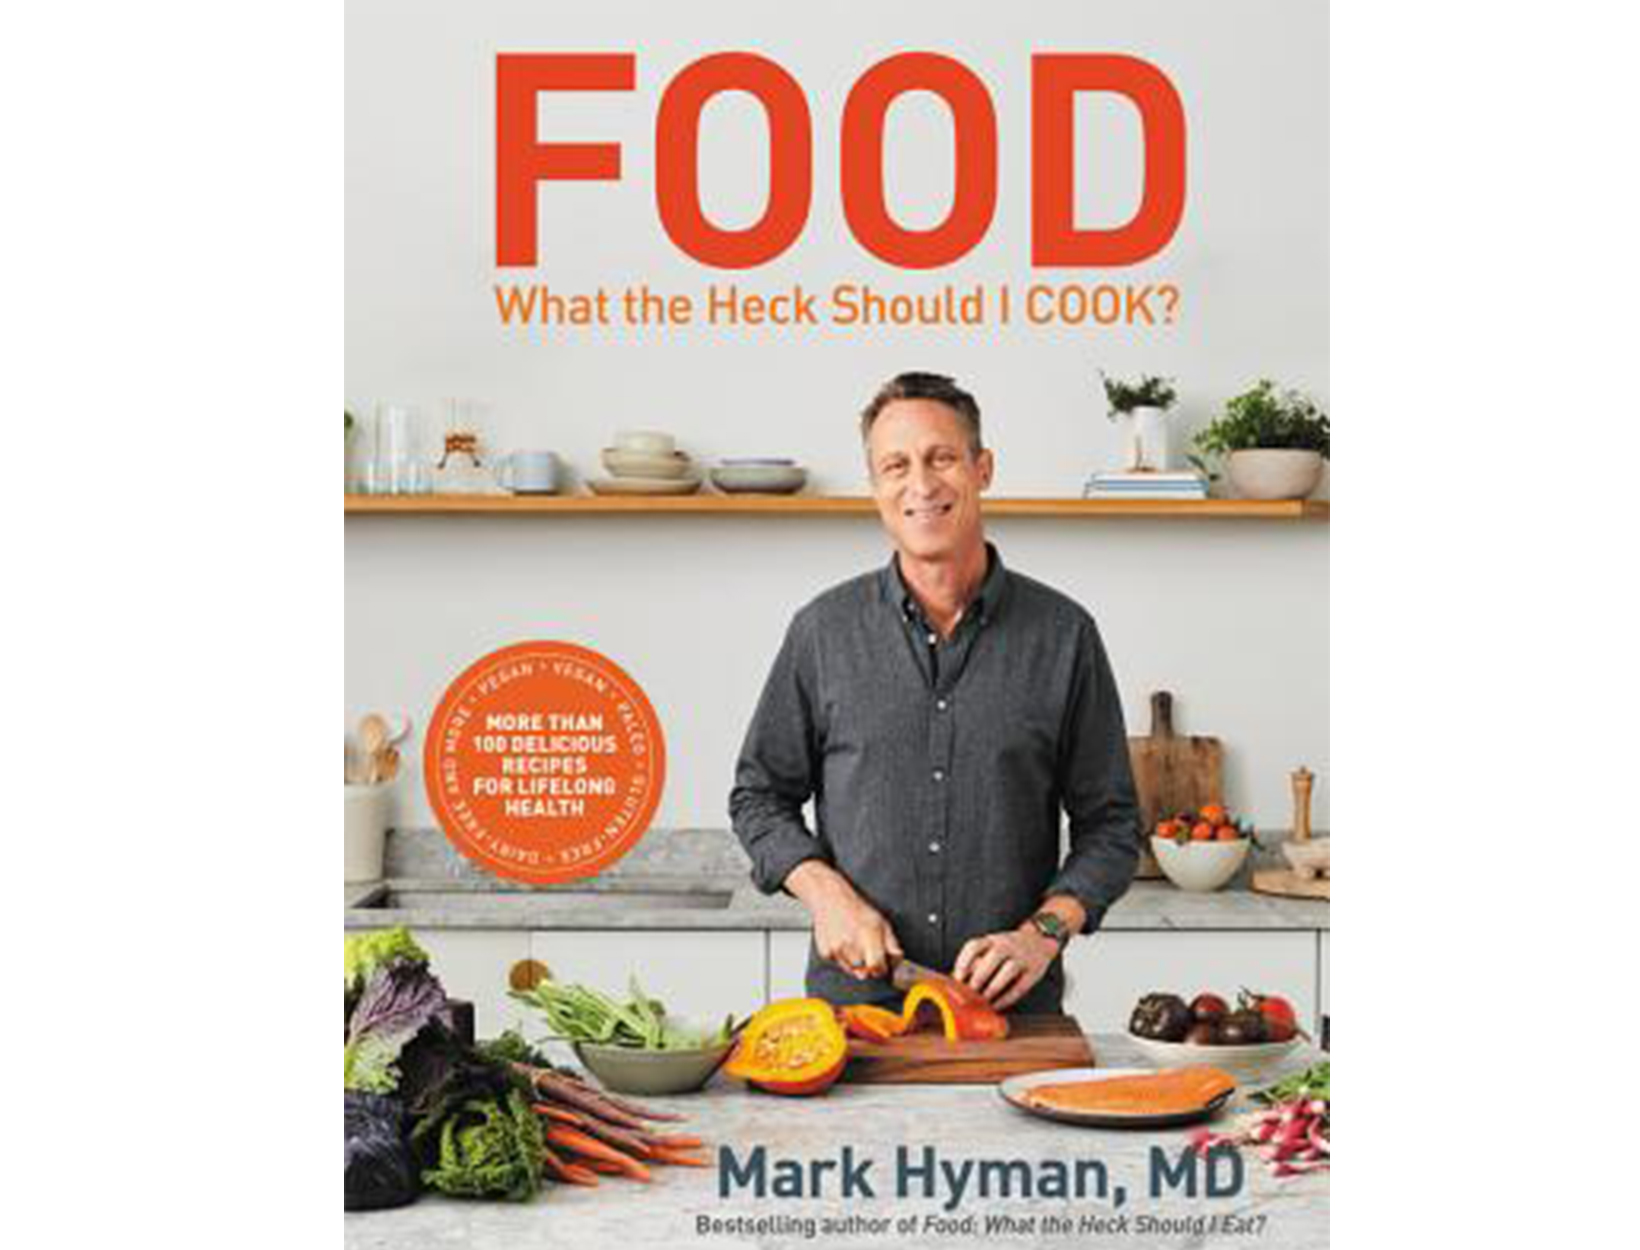 <em>What the Heck Should I Cook?</em> by Mark Hyman, MD